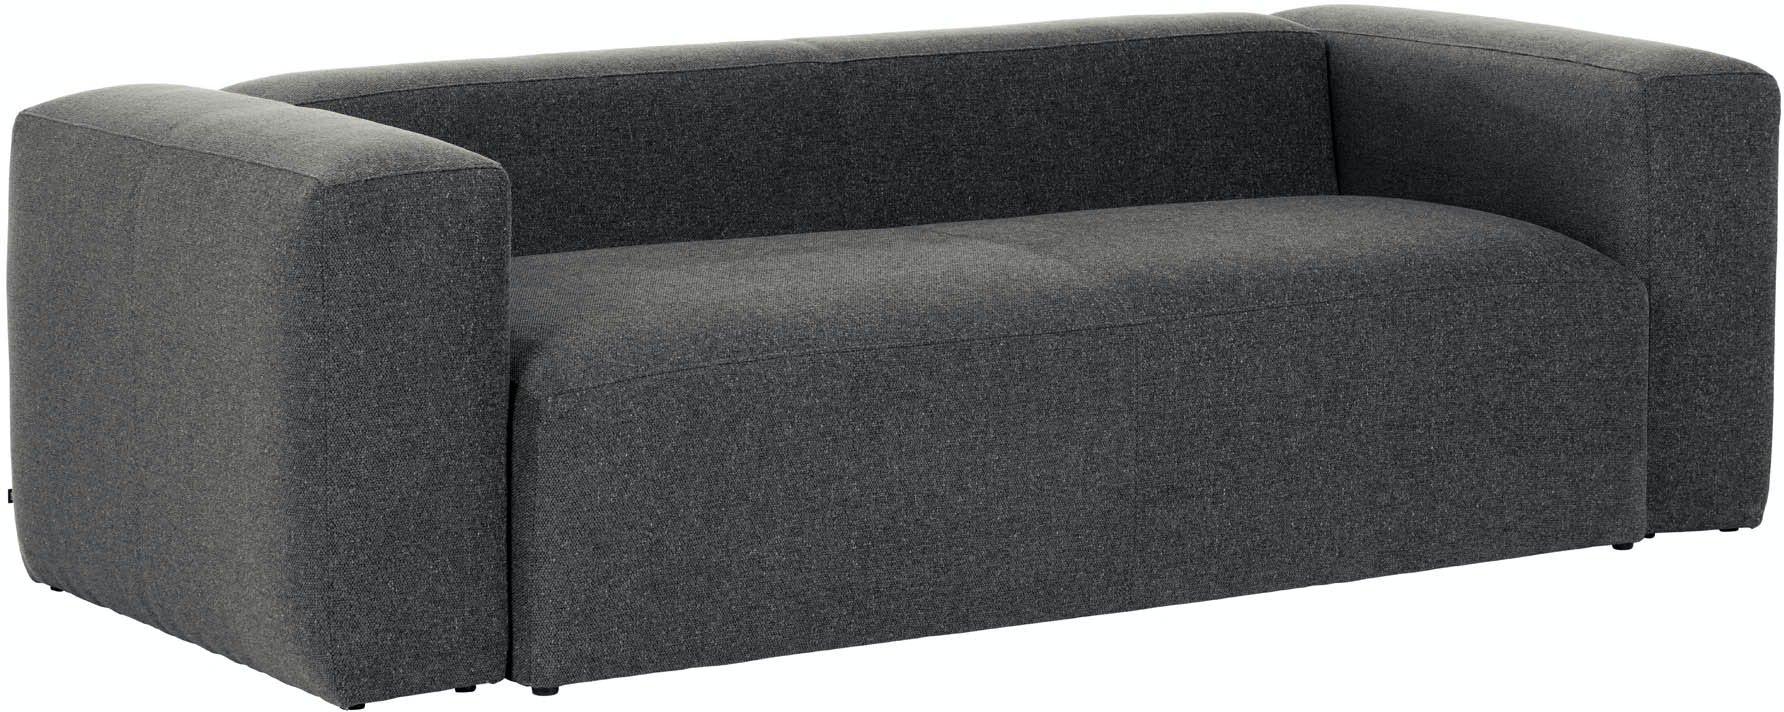 Blok, 3-personers sofa, Stof by LaForma (H: 69 cm. B: 210 cm. L: 100 cm., Grå)